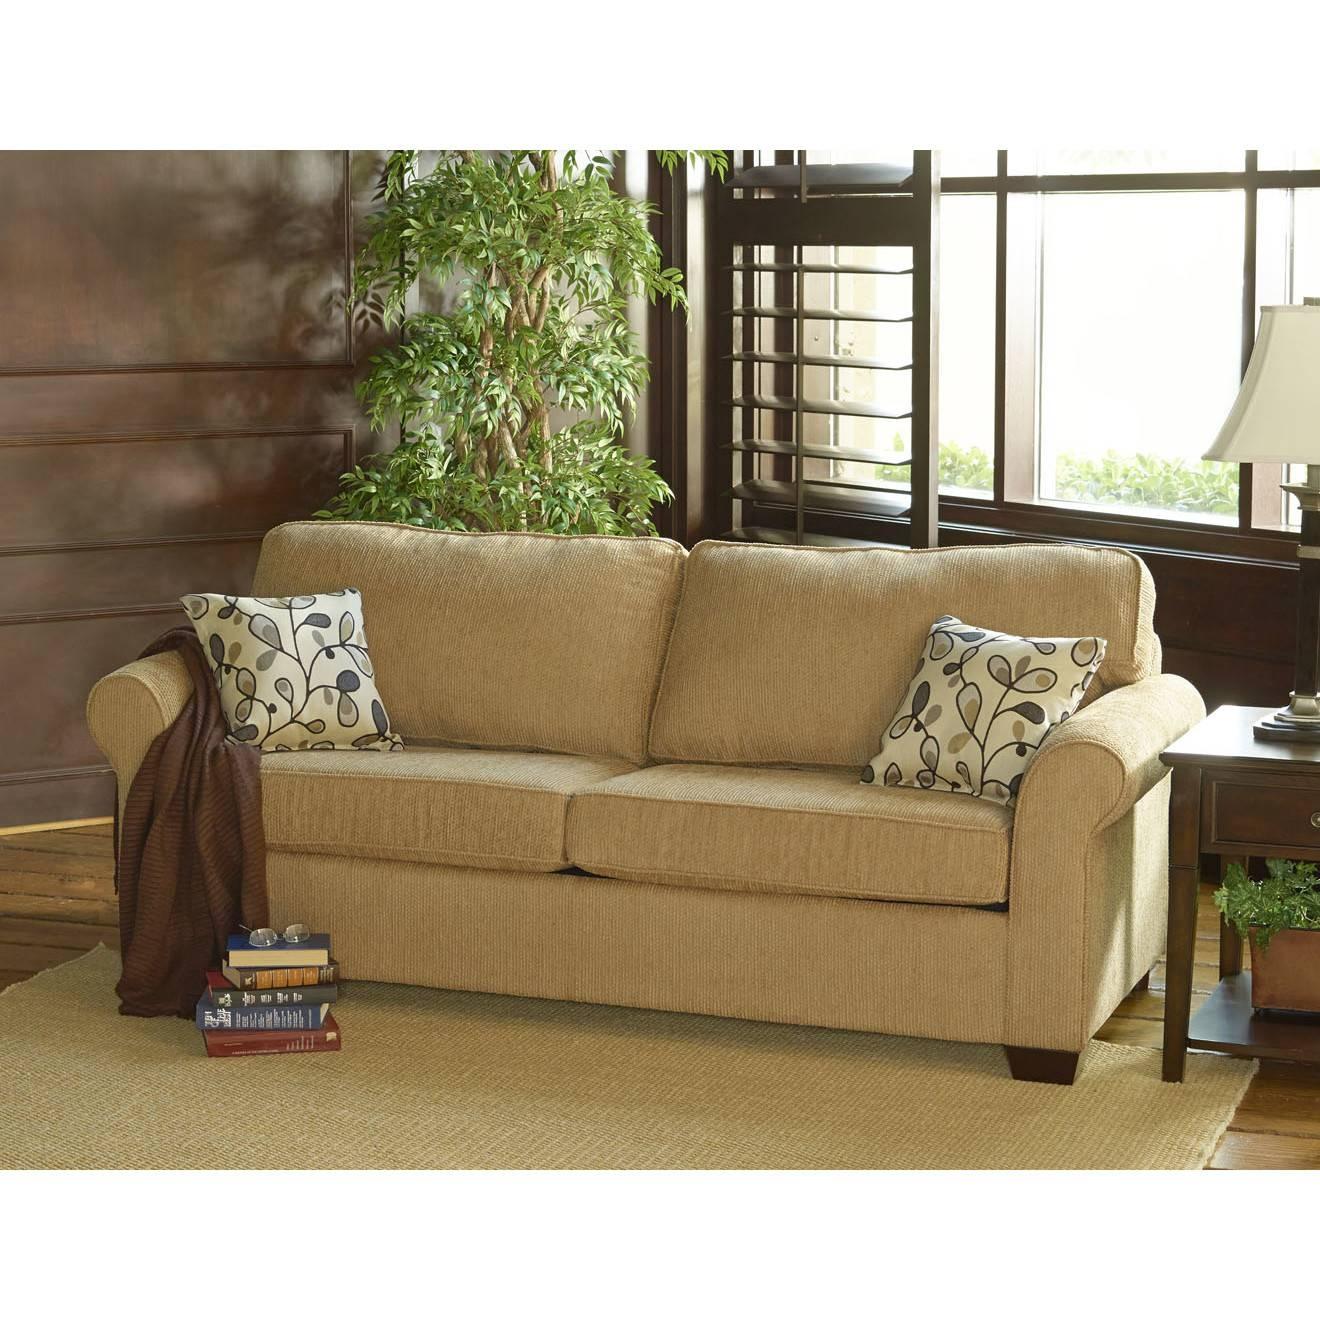 Living Room Sofa Sleeper Sheets Full Prime Sofas Center Gorgeous inside Sofa Sleeper Sheets (Image 2 of 15)